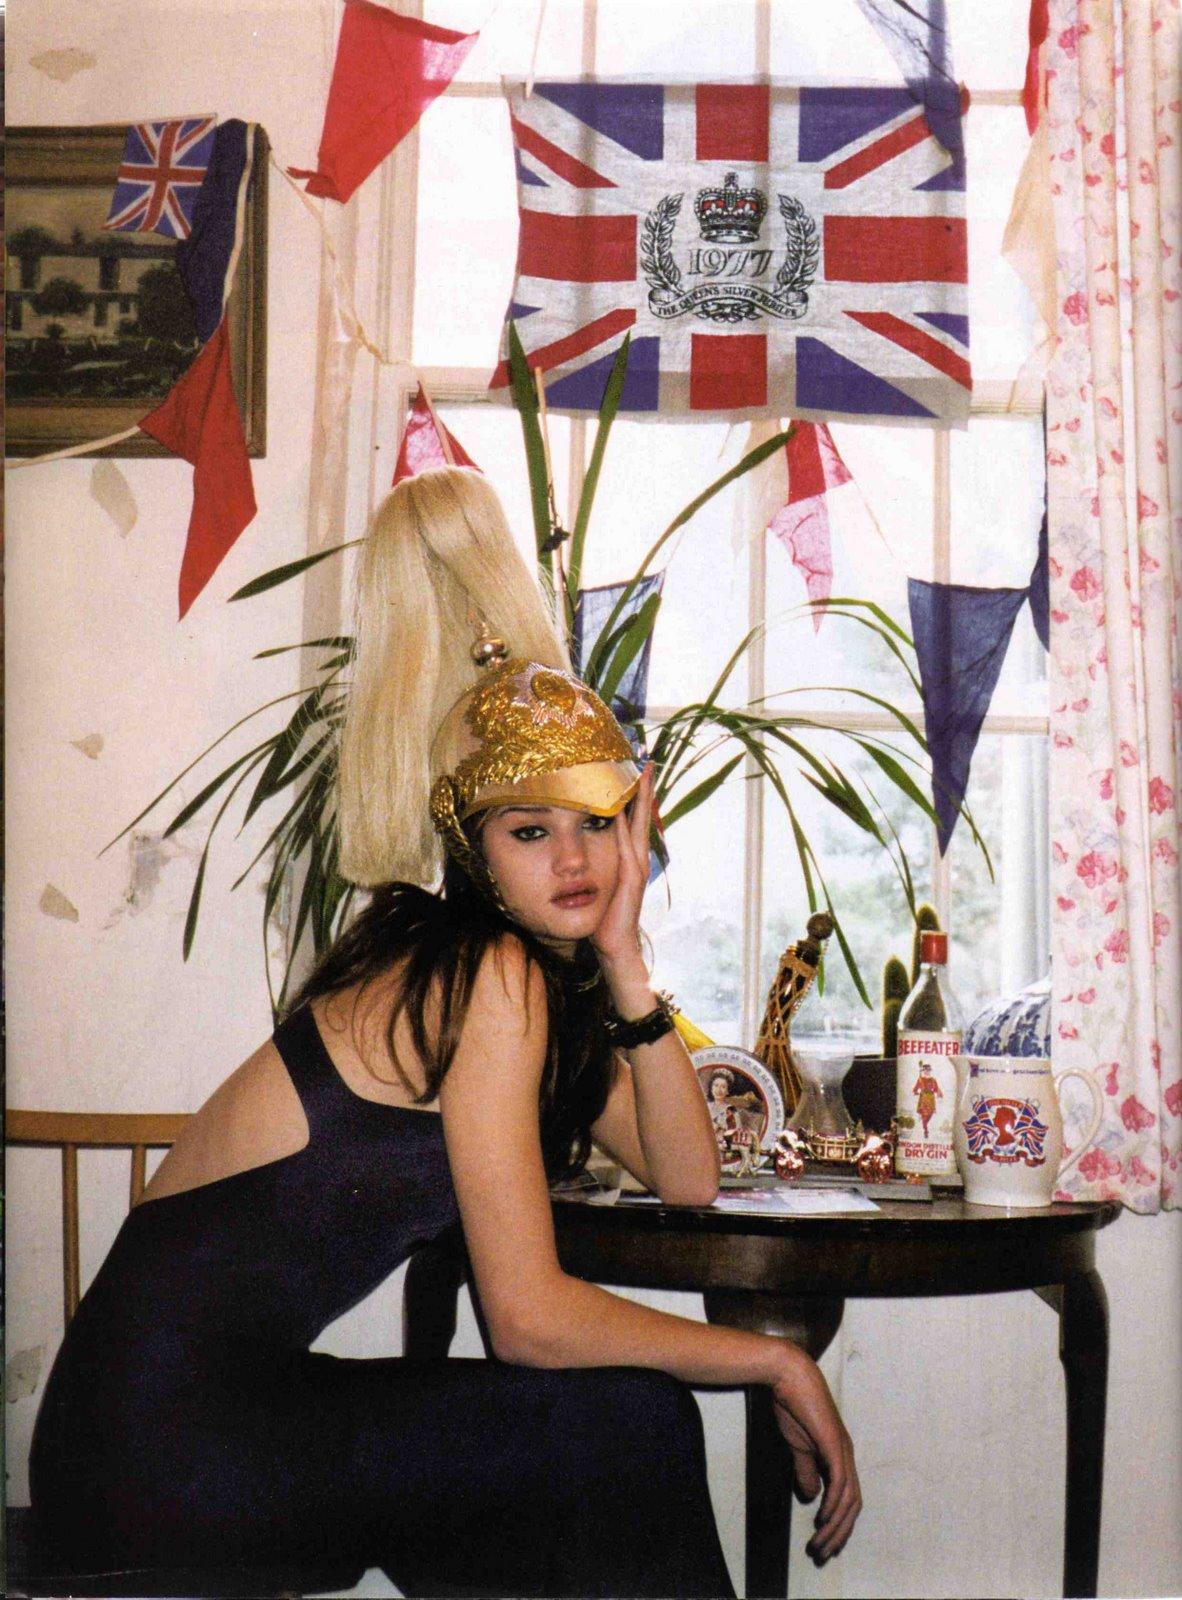 http://1.bp.blogspot.com/_ajCljSdsfY4/SXJSrwaFUqI/AAAAAAAAF7E/-OabGNAjxiQ/s1600/Rule+Brittania9.jpg